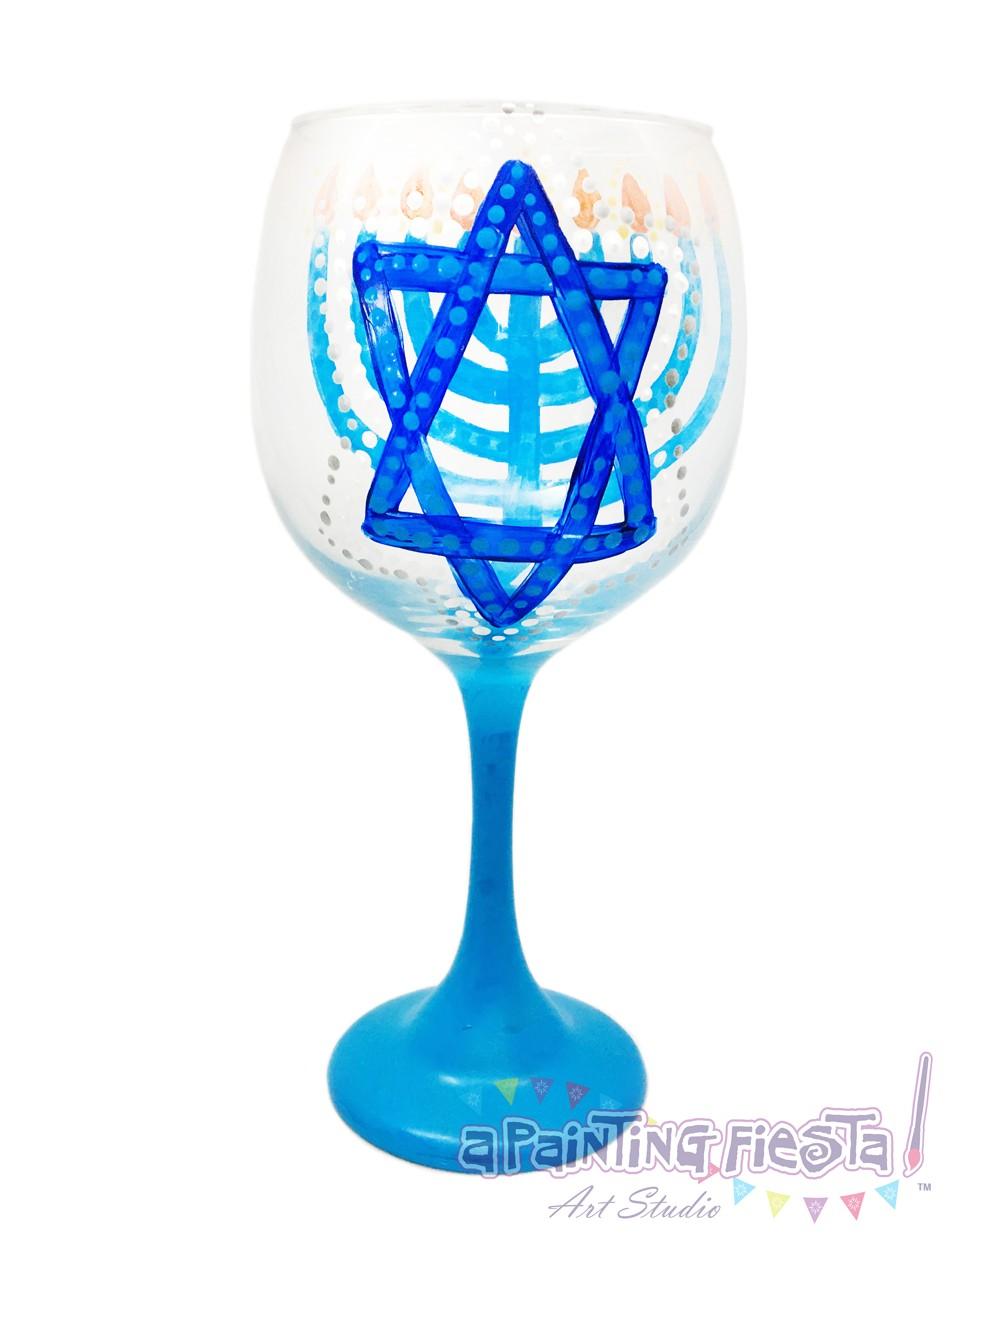 wine glass painting 2017 11 28